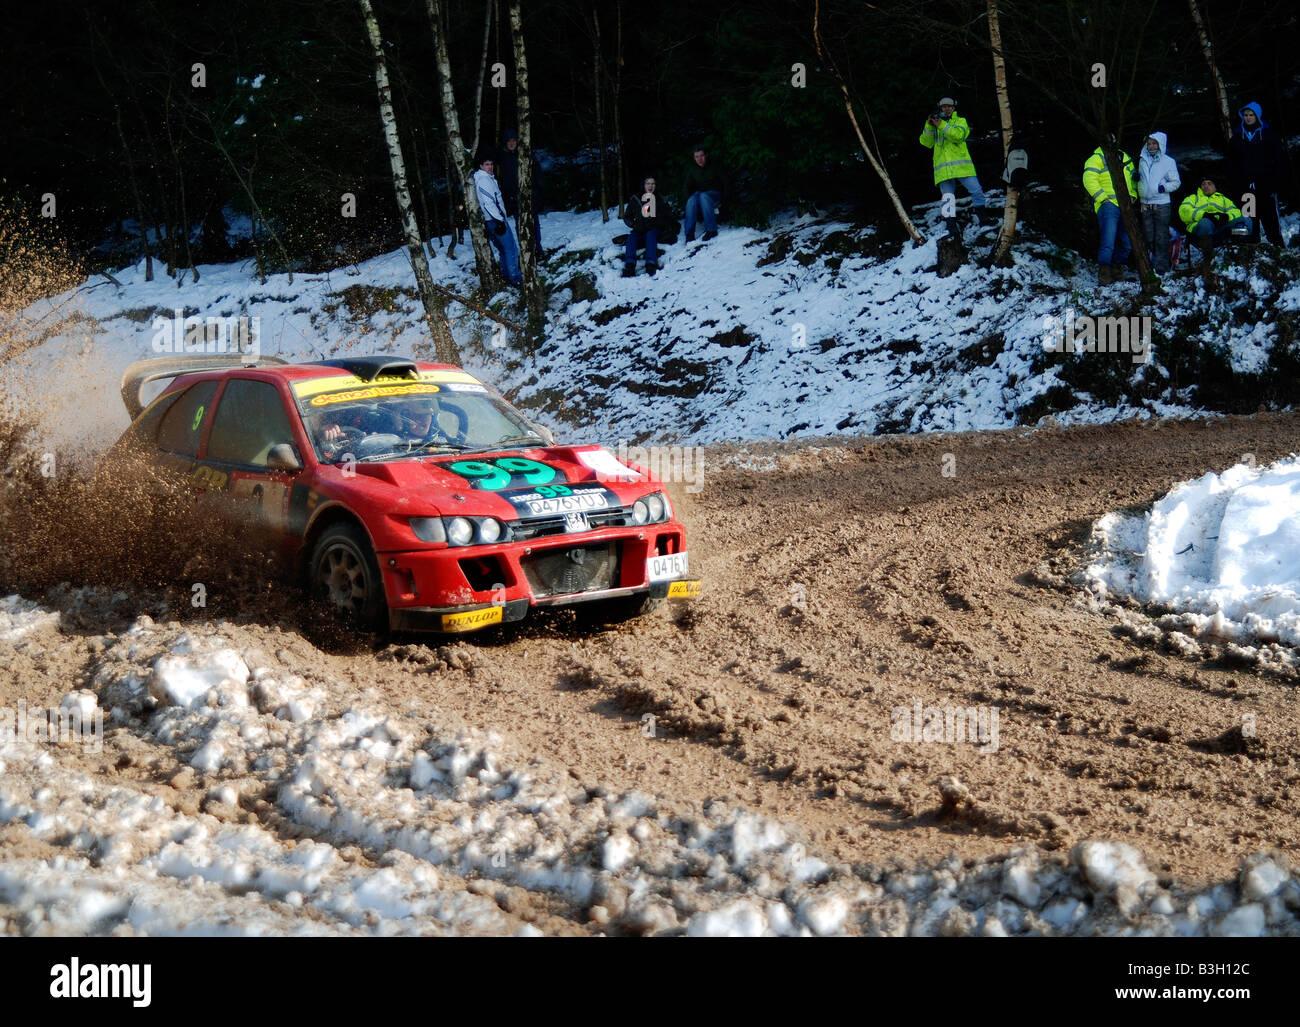 Querido Inmuebles Escritor  Andy Burton V6 Peugeot Cosworth rally car Stock Photo - Alamy